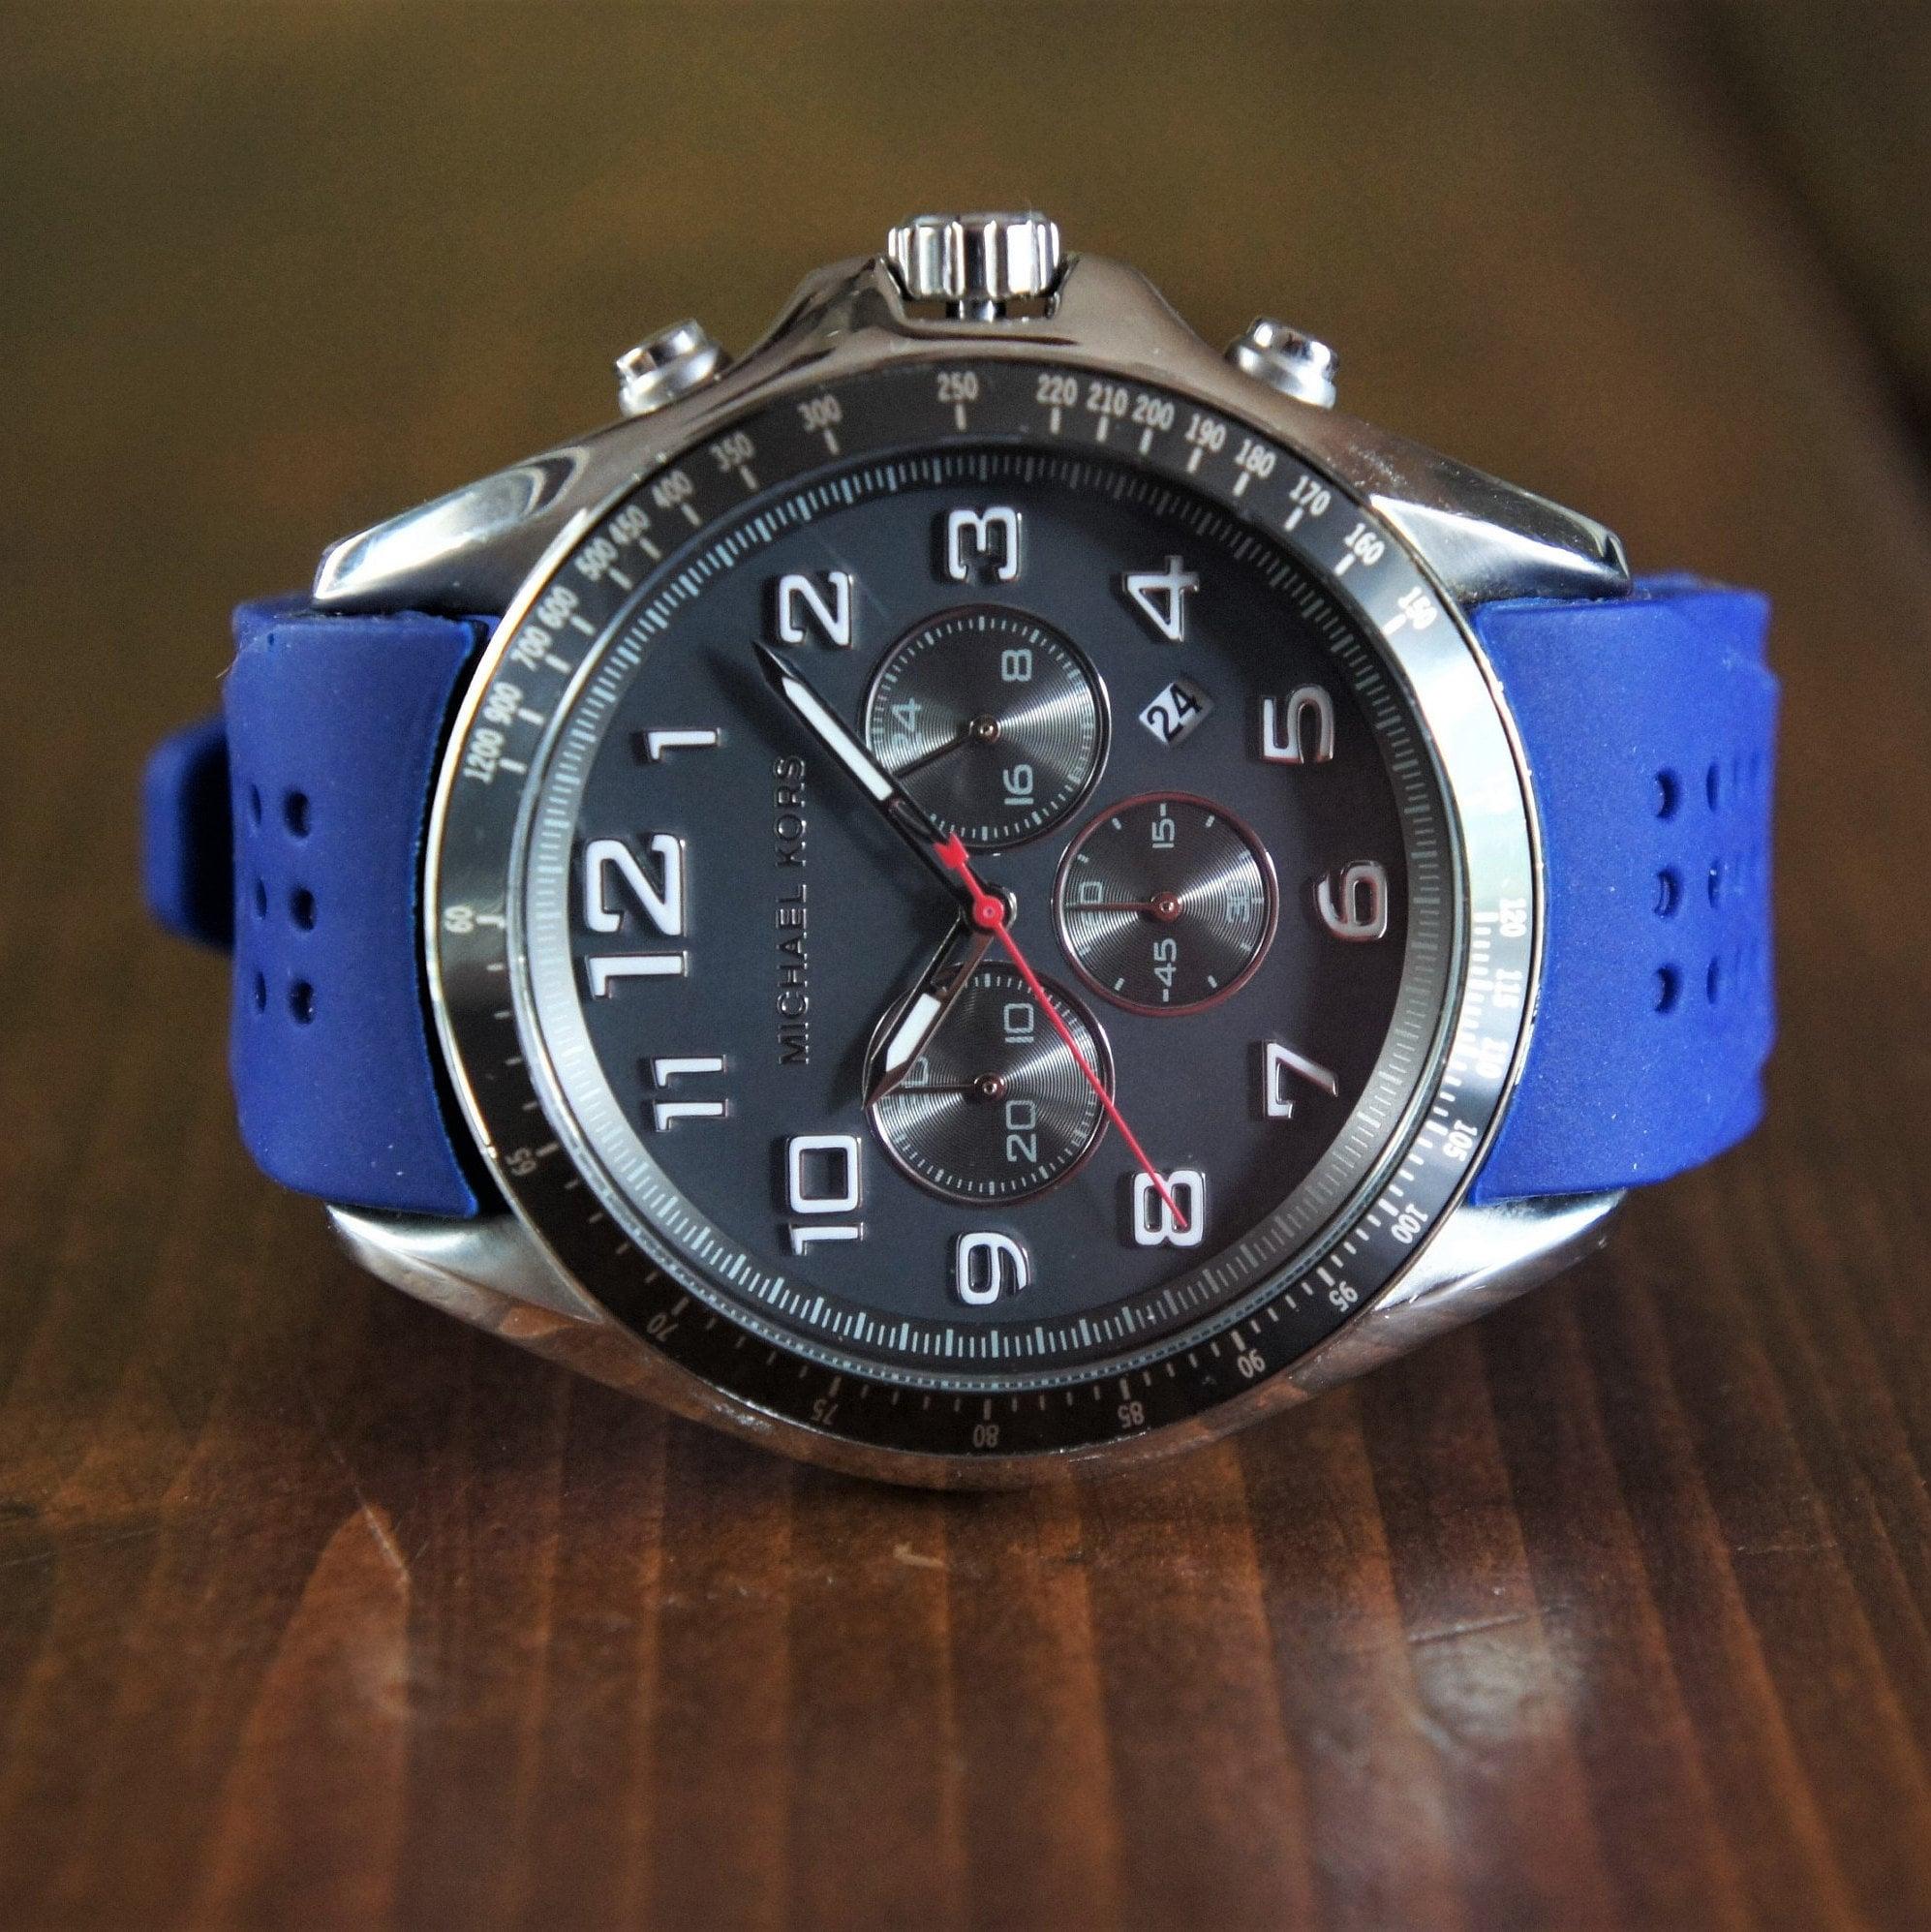 c52b5b16de0e Michael Kors men s fashion watch chronograph diver watch